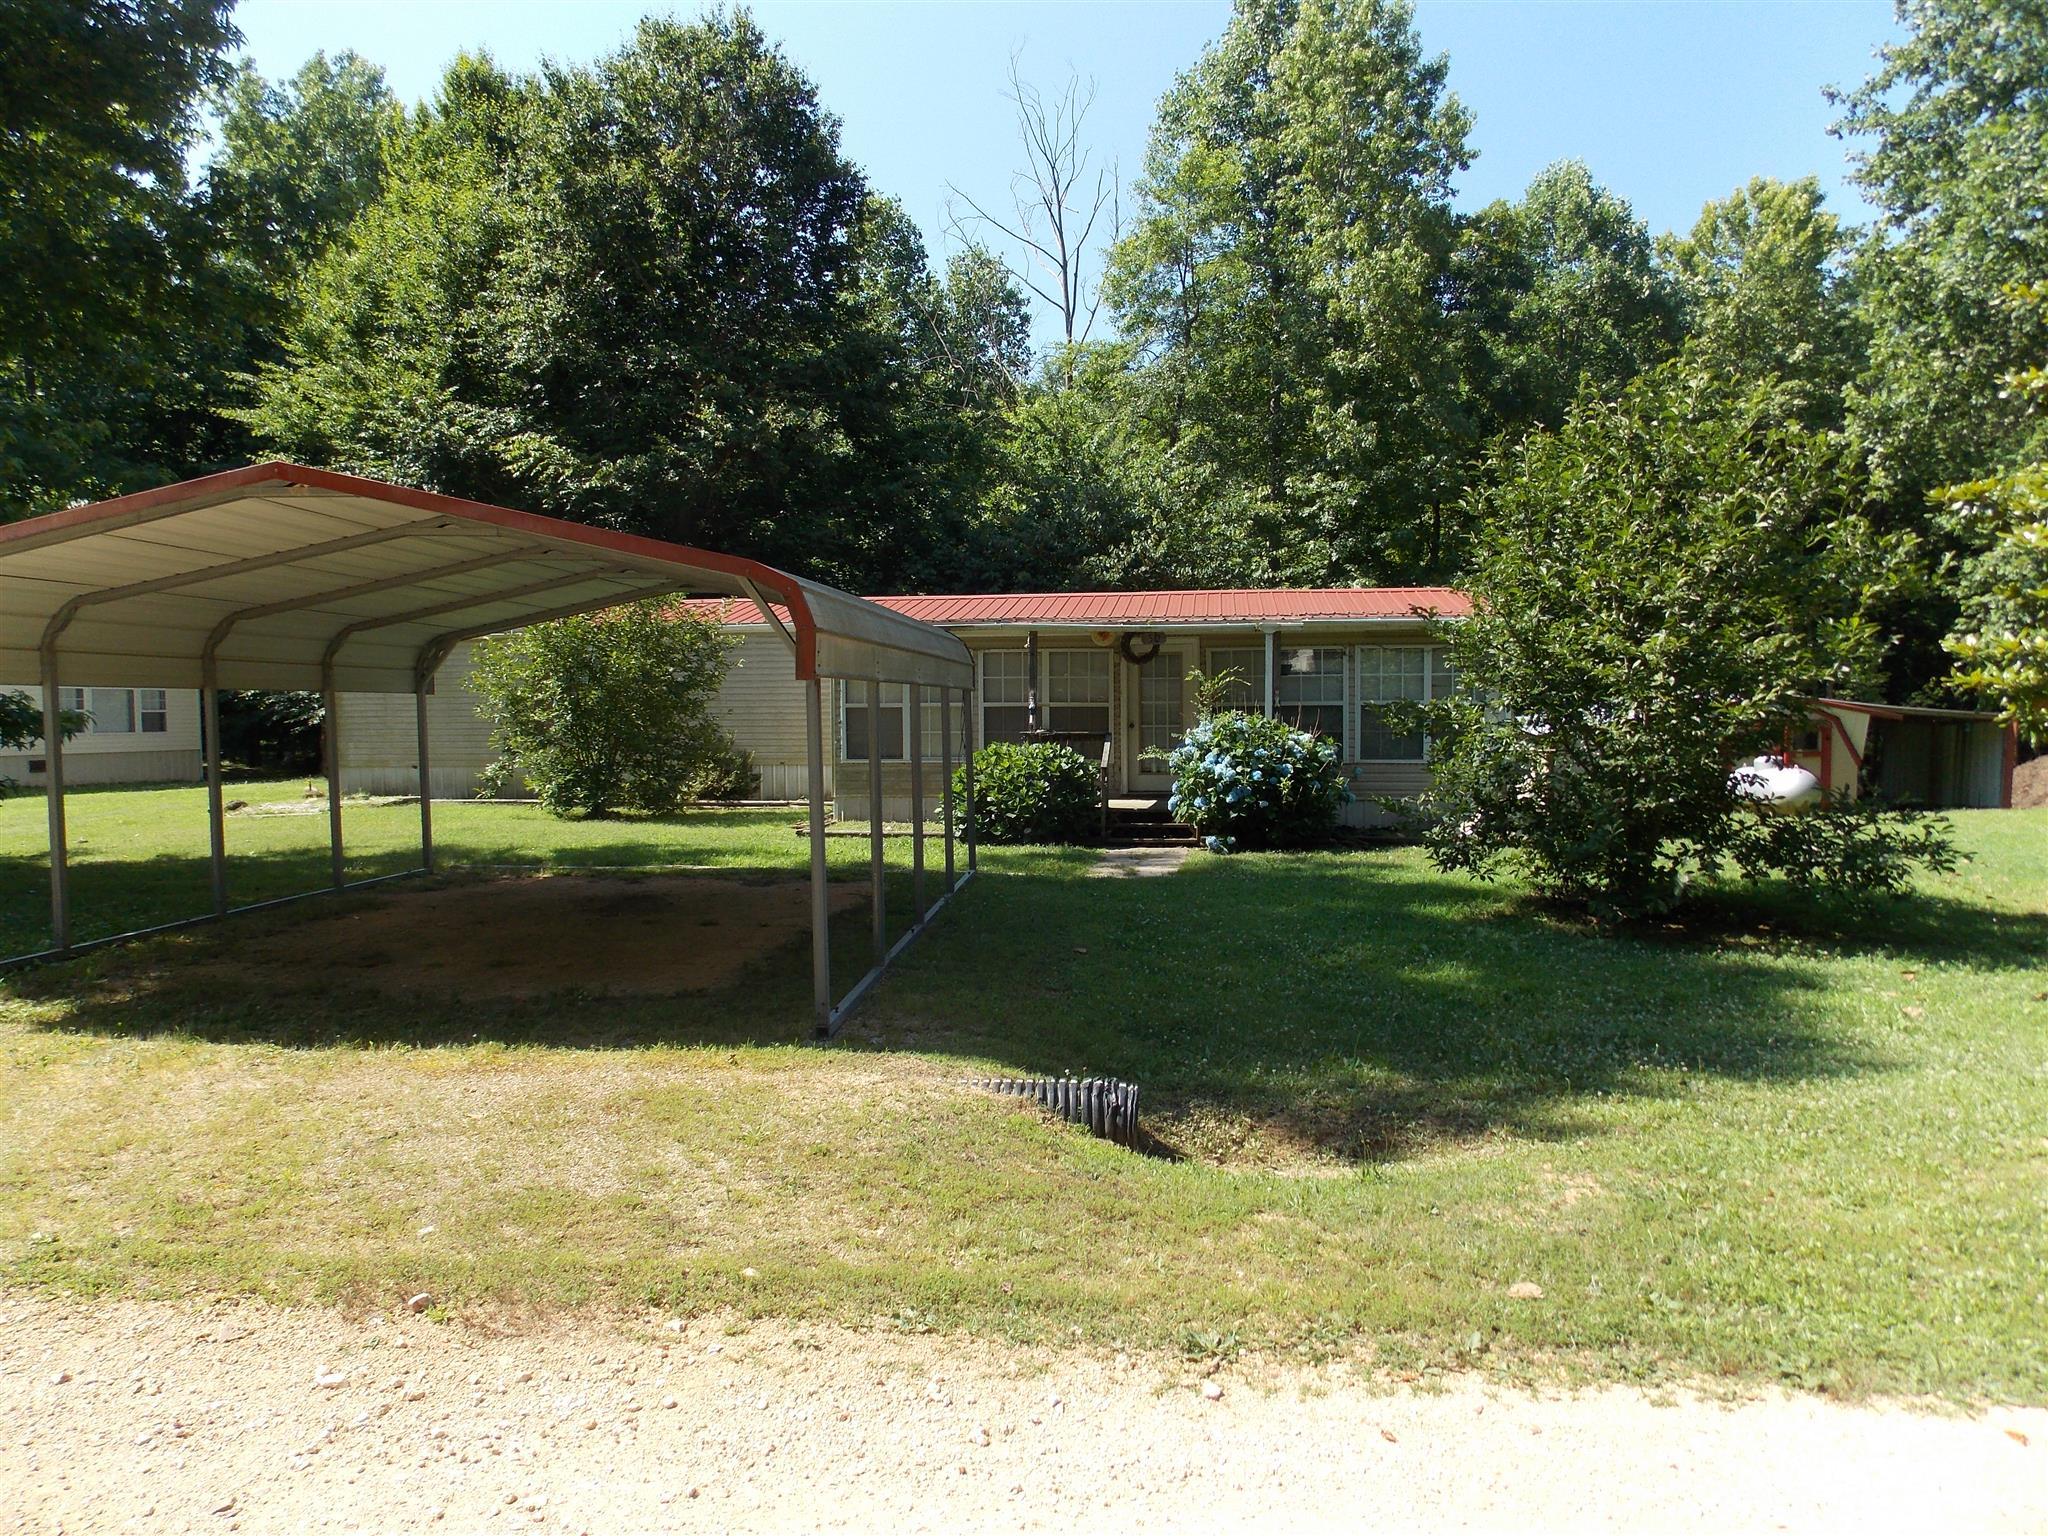 Photo of 50 Cresent Ridge Rd  Lobelville  TN